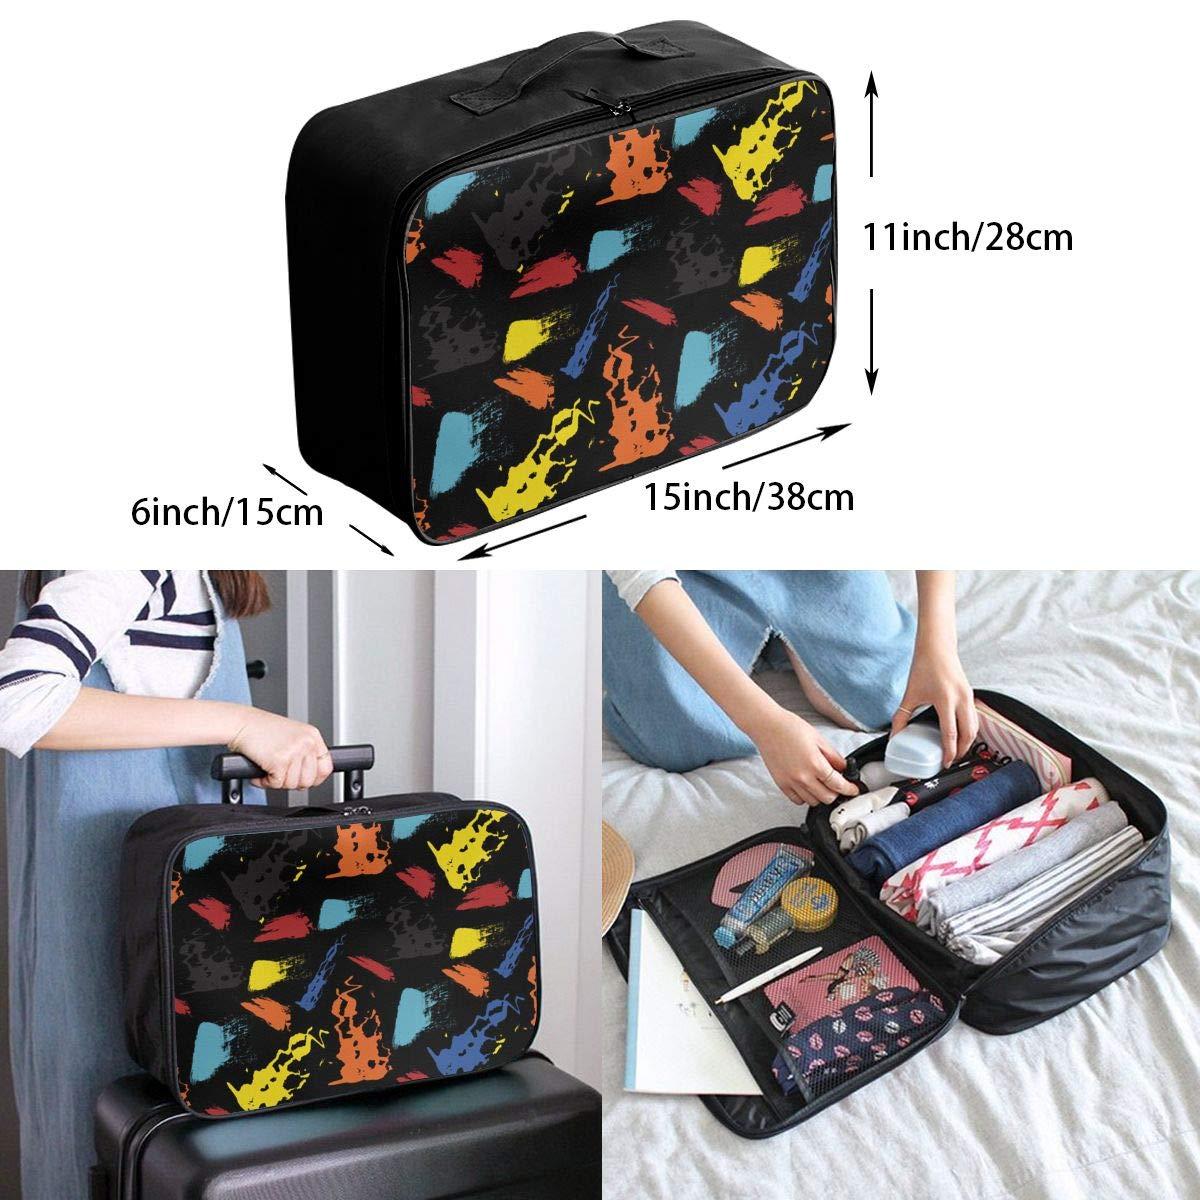 ADGAI Dark Random Graffiti Canvas Travel Weekender Bag,Fashion Custom Lightweight Large Capacity Portable Luggage Bag,Suitcase Trolley Bag